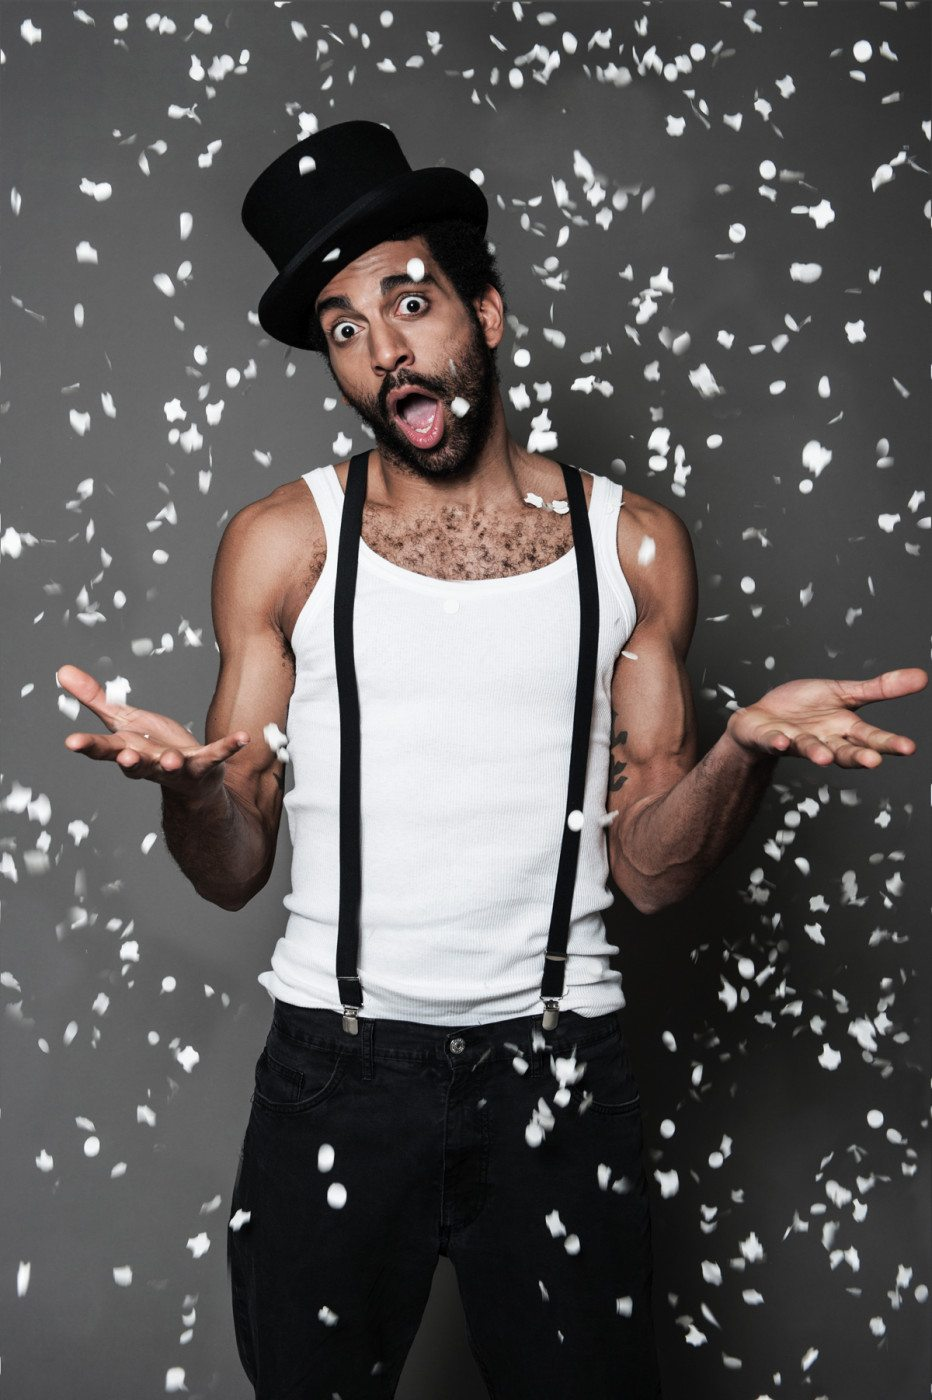 fotografia di musica del rapper mudimbi